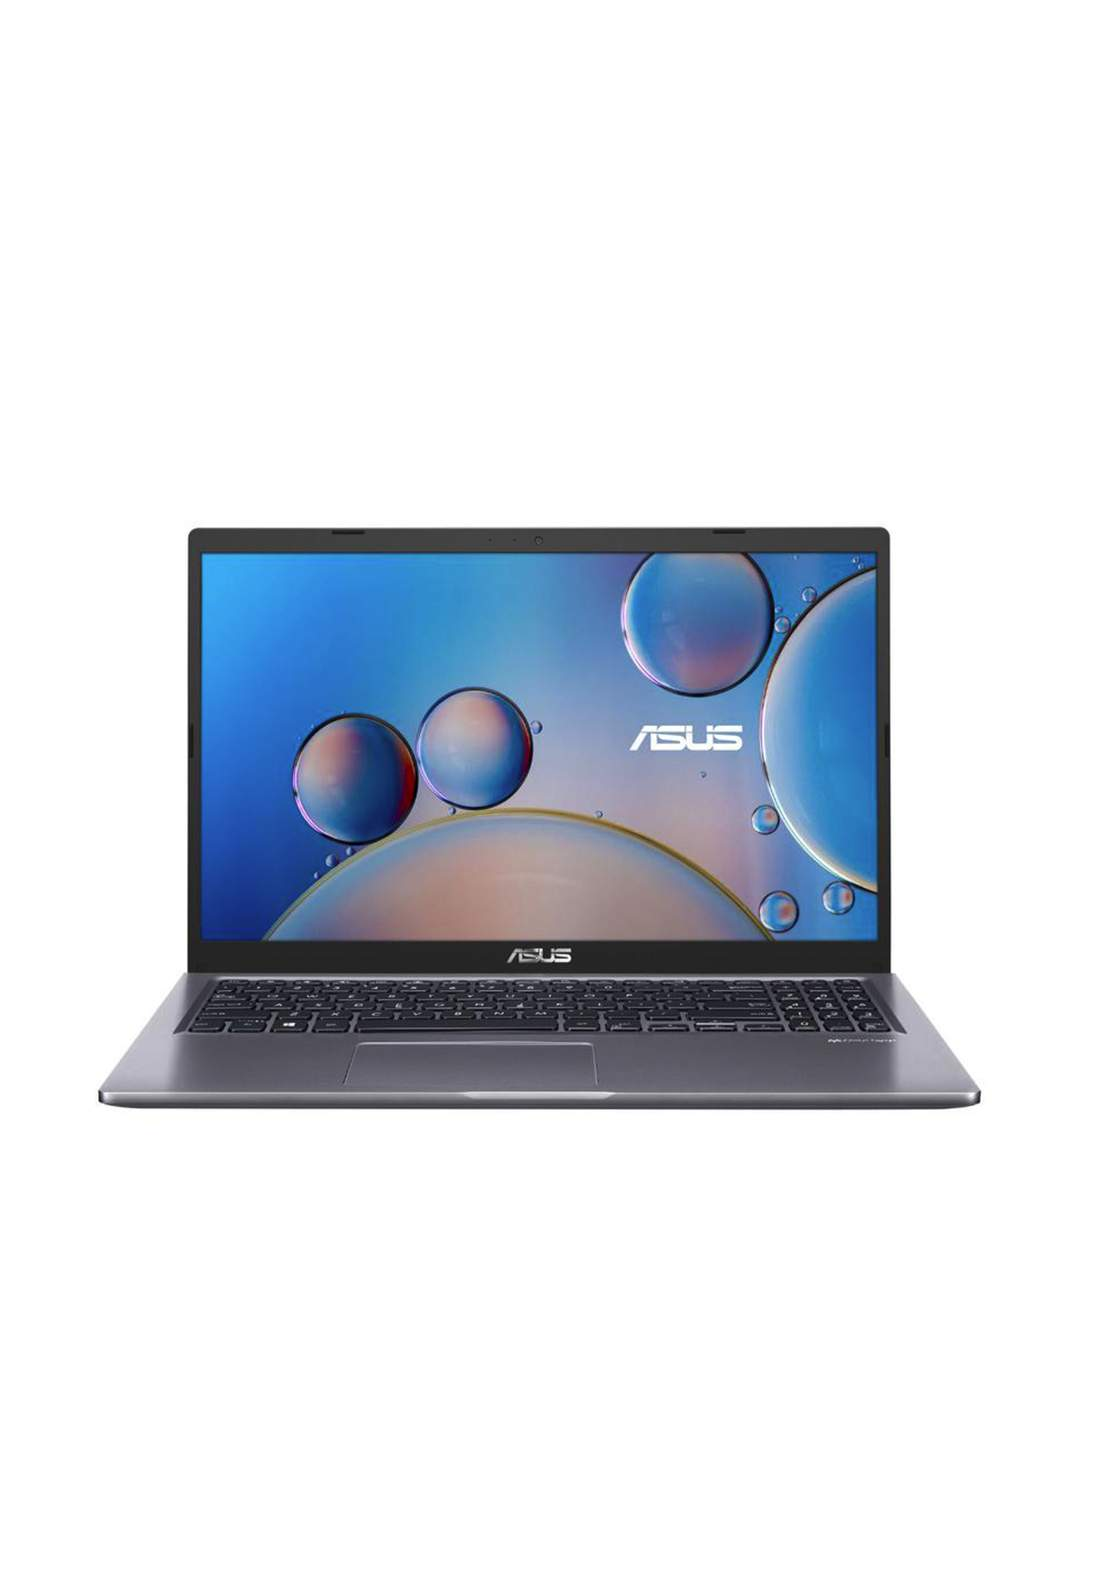 Asus VivoBook X515JA-BR051-I3 - Core i3-1005G1 - 4 GB RAM -  1TB HDD - Gray